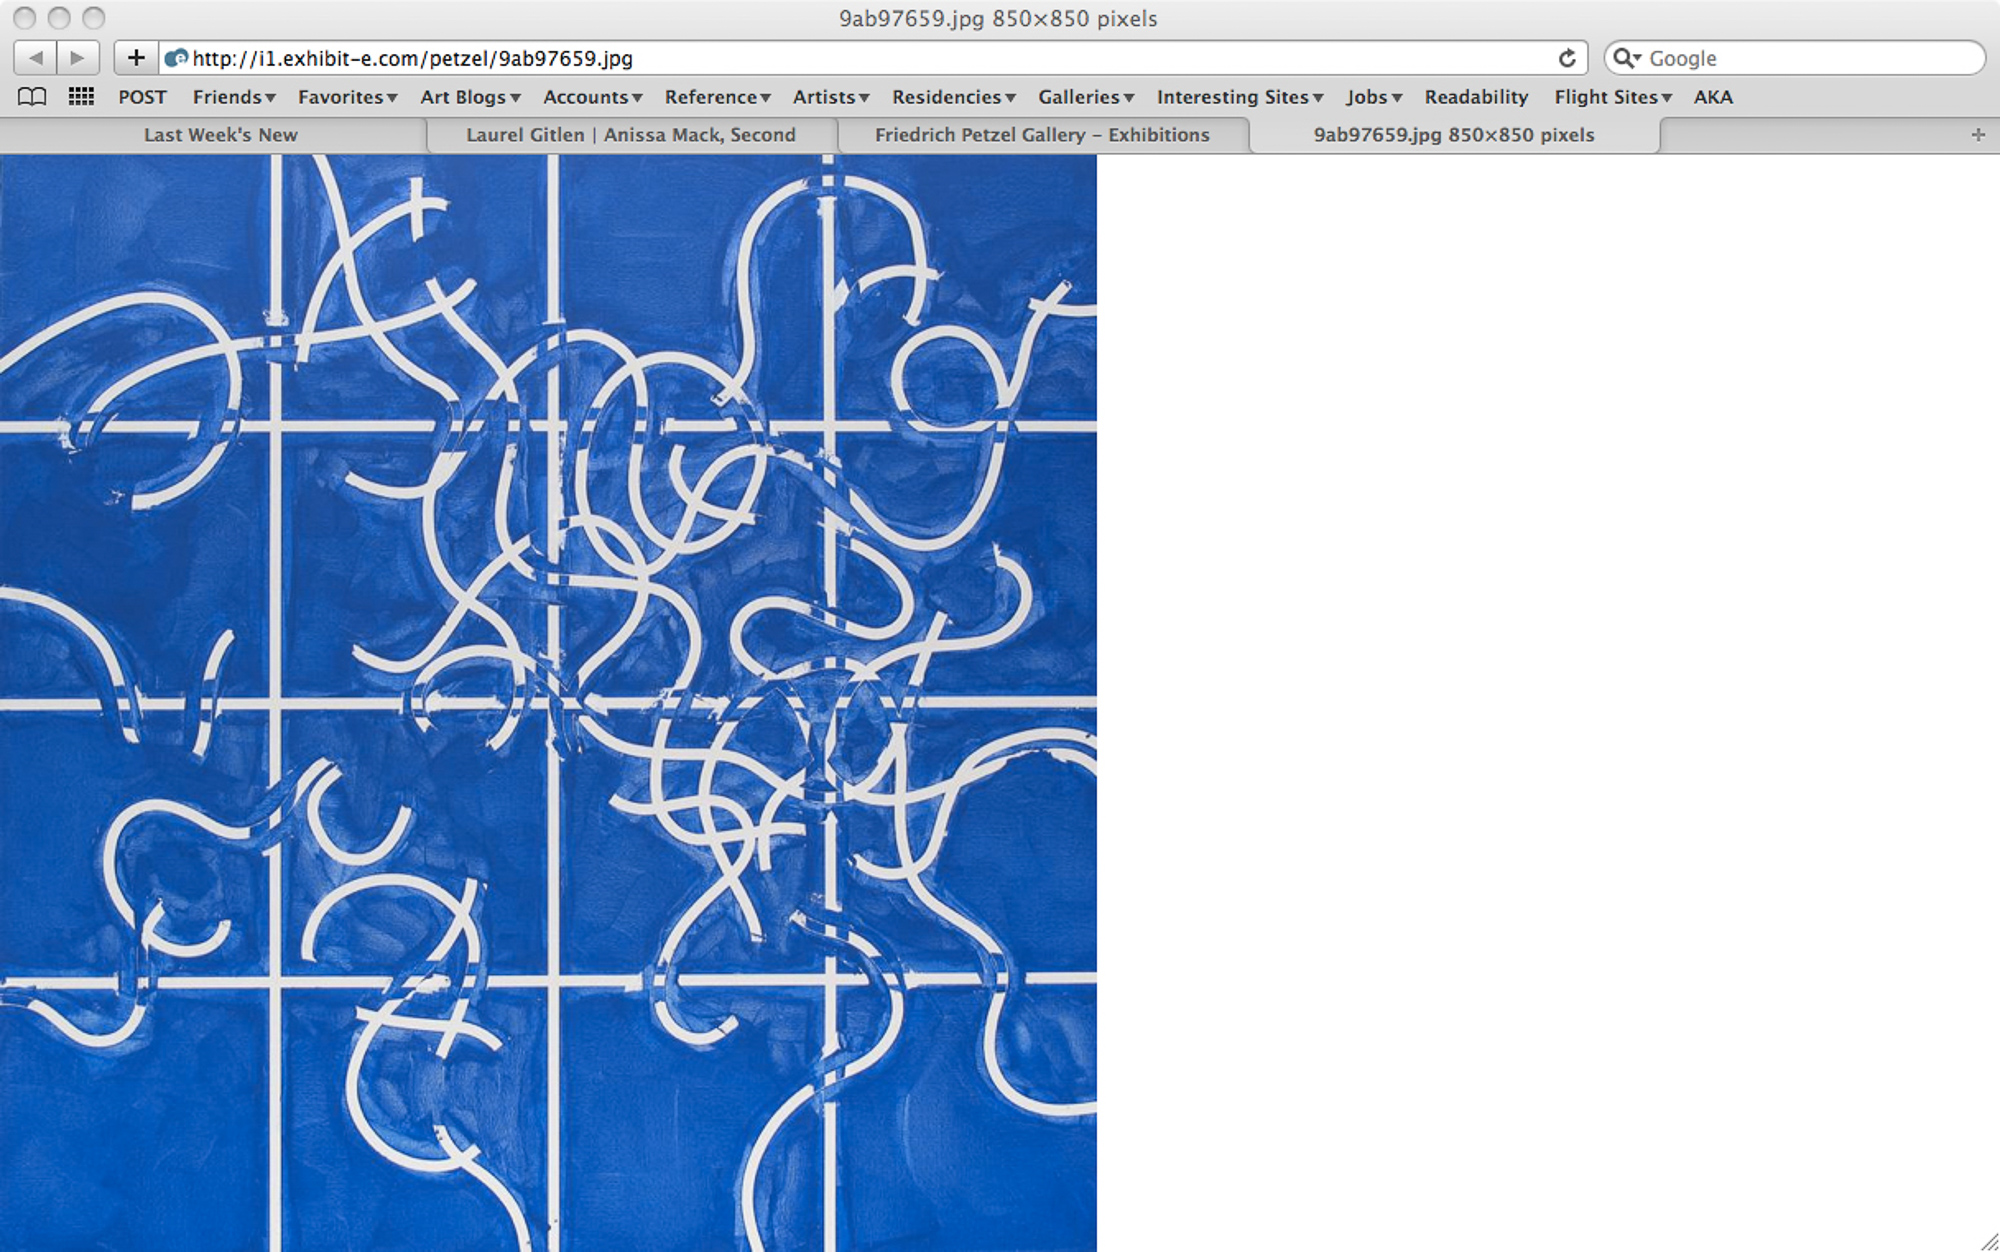 Closings: March 19-27, 2011 (New York, Berlin, Los Angeles, London, Tokyo, Munich, Paris, Madrid) |2011